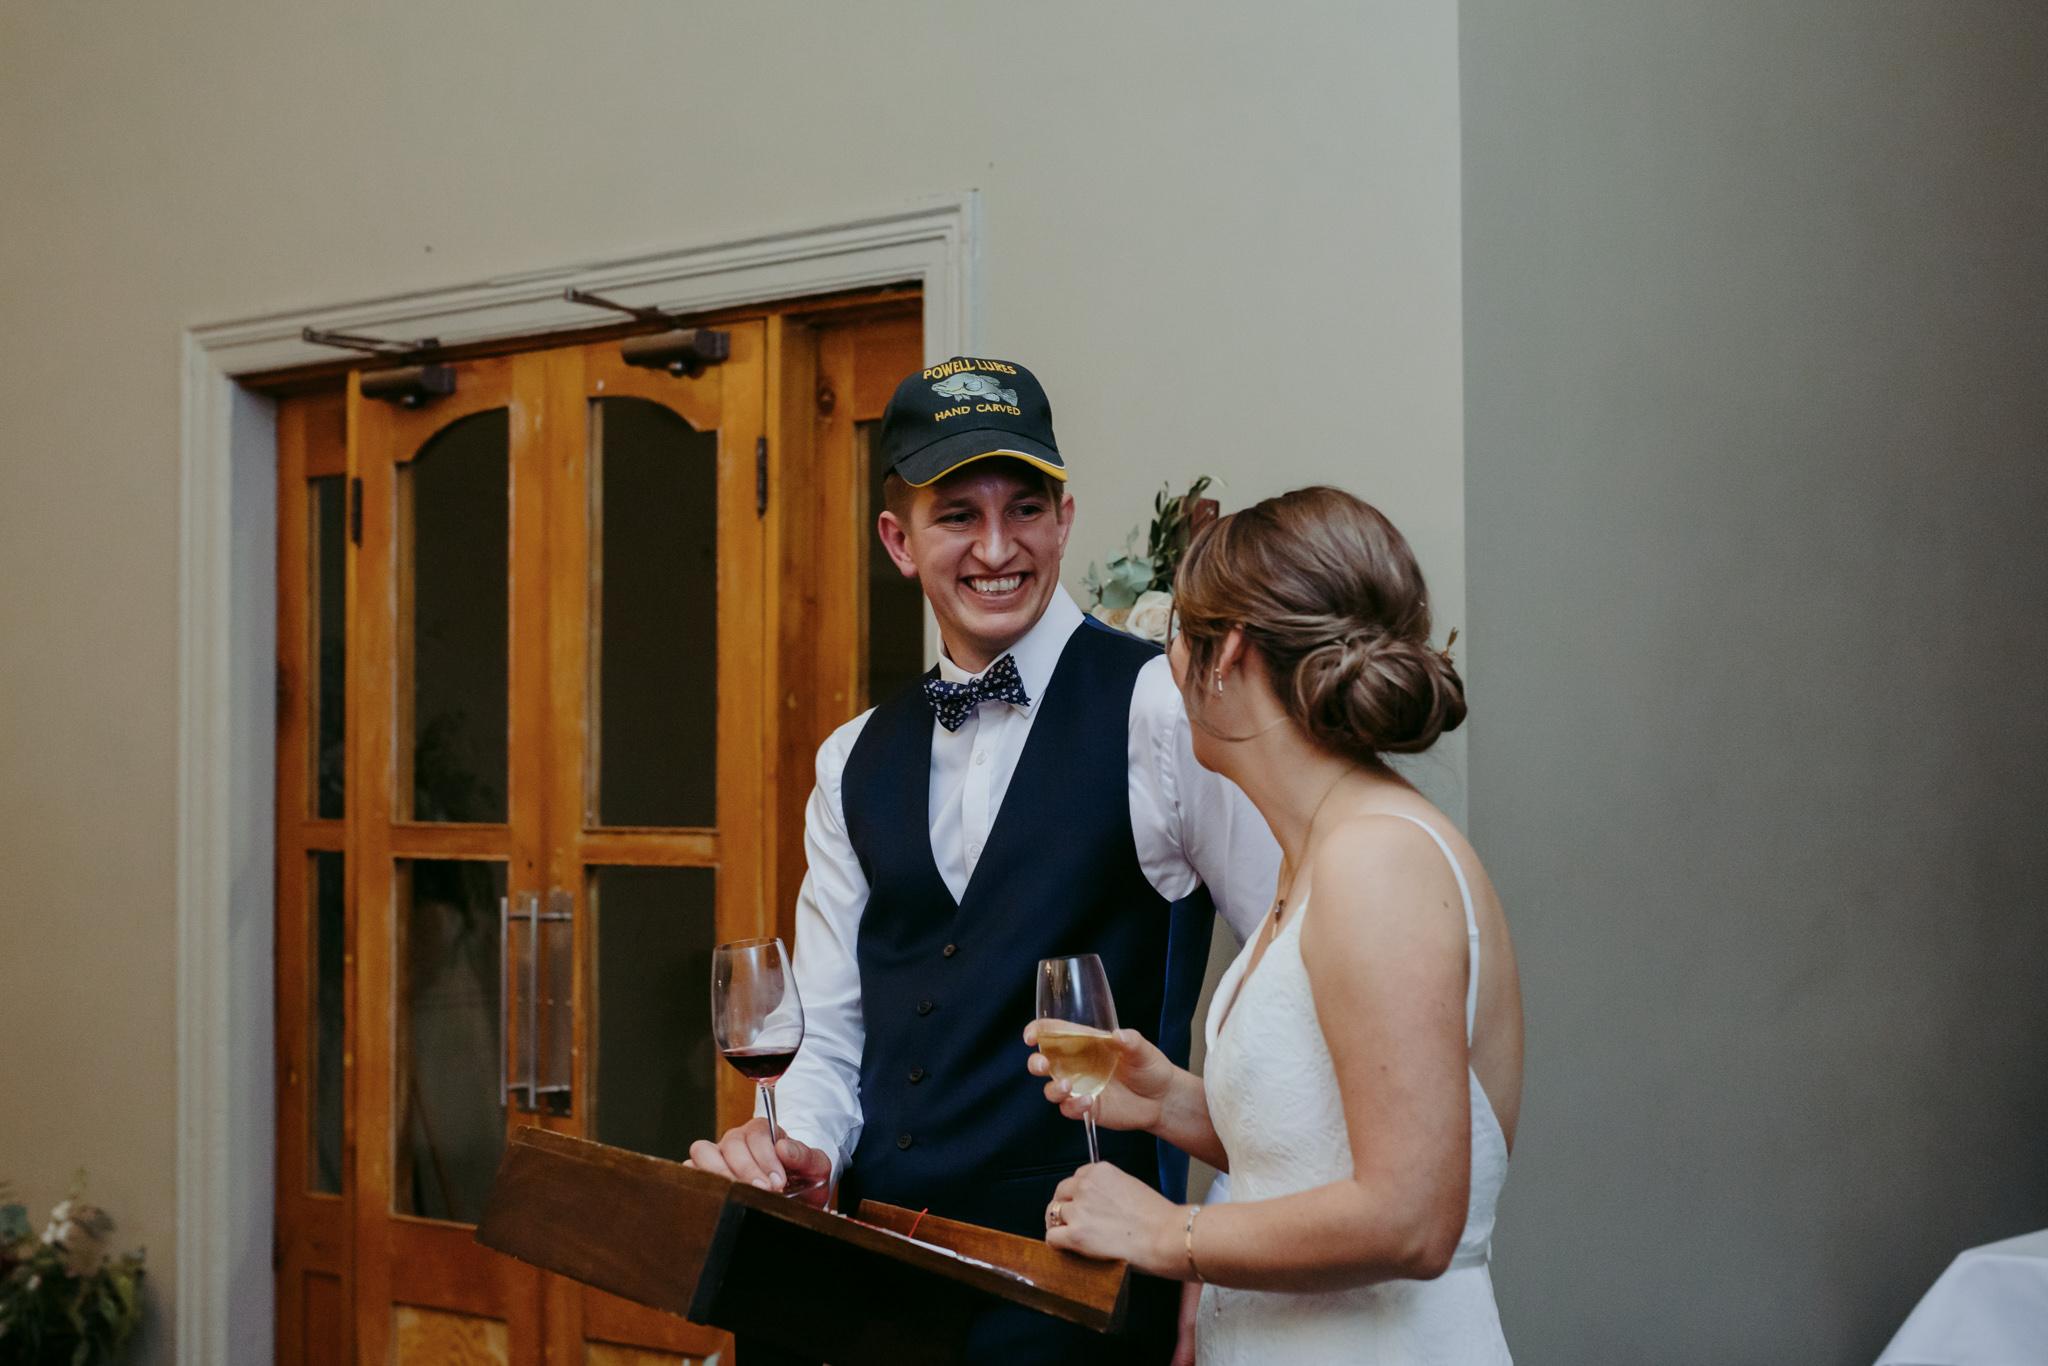 Erin Latimore Mudgee Canberra Wedding Photographer ROSEBANK GUESTHOUSE OLD THEATRE TONIC MILLTHORPE_776.JPG